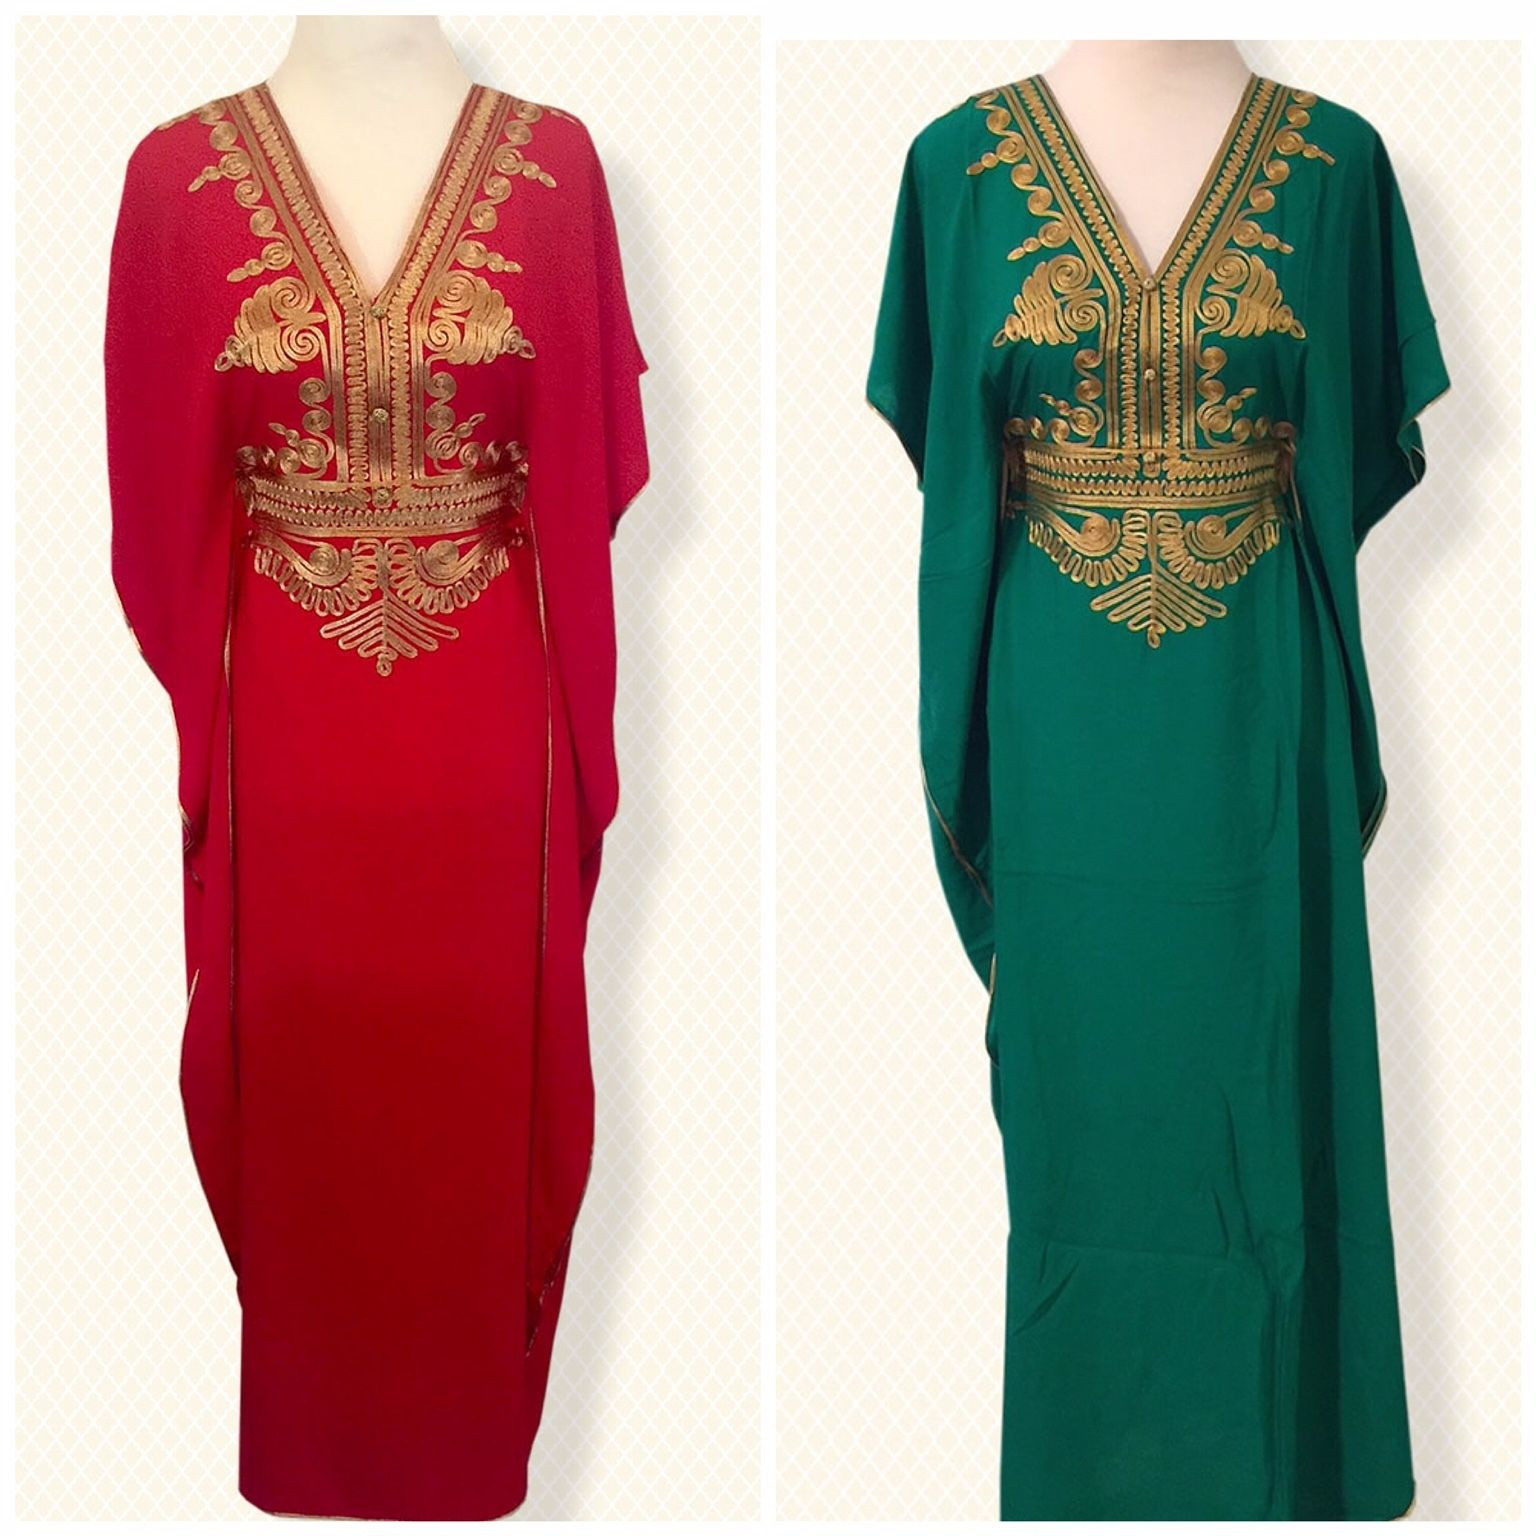 Cool Moroccan kaftan Embroidery Batwing Maxi Dress Dubai Sexy Arabian Abaya  one size 2019 cd27b919d66